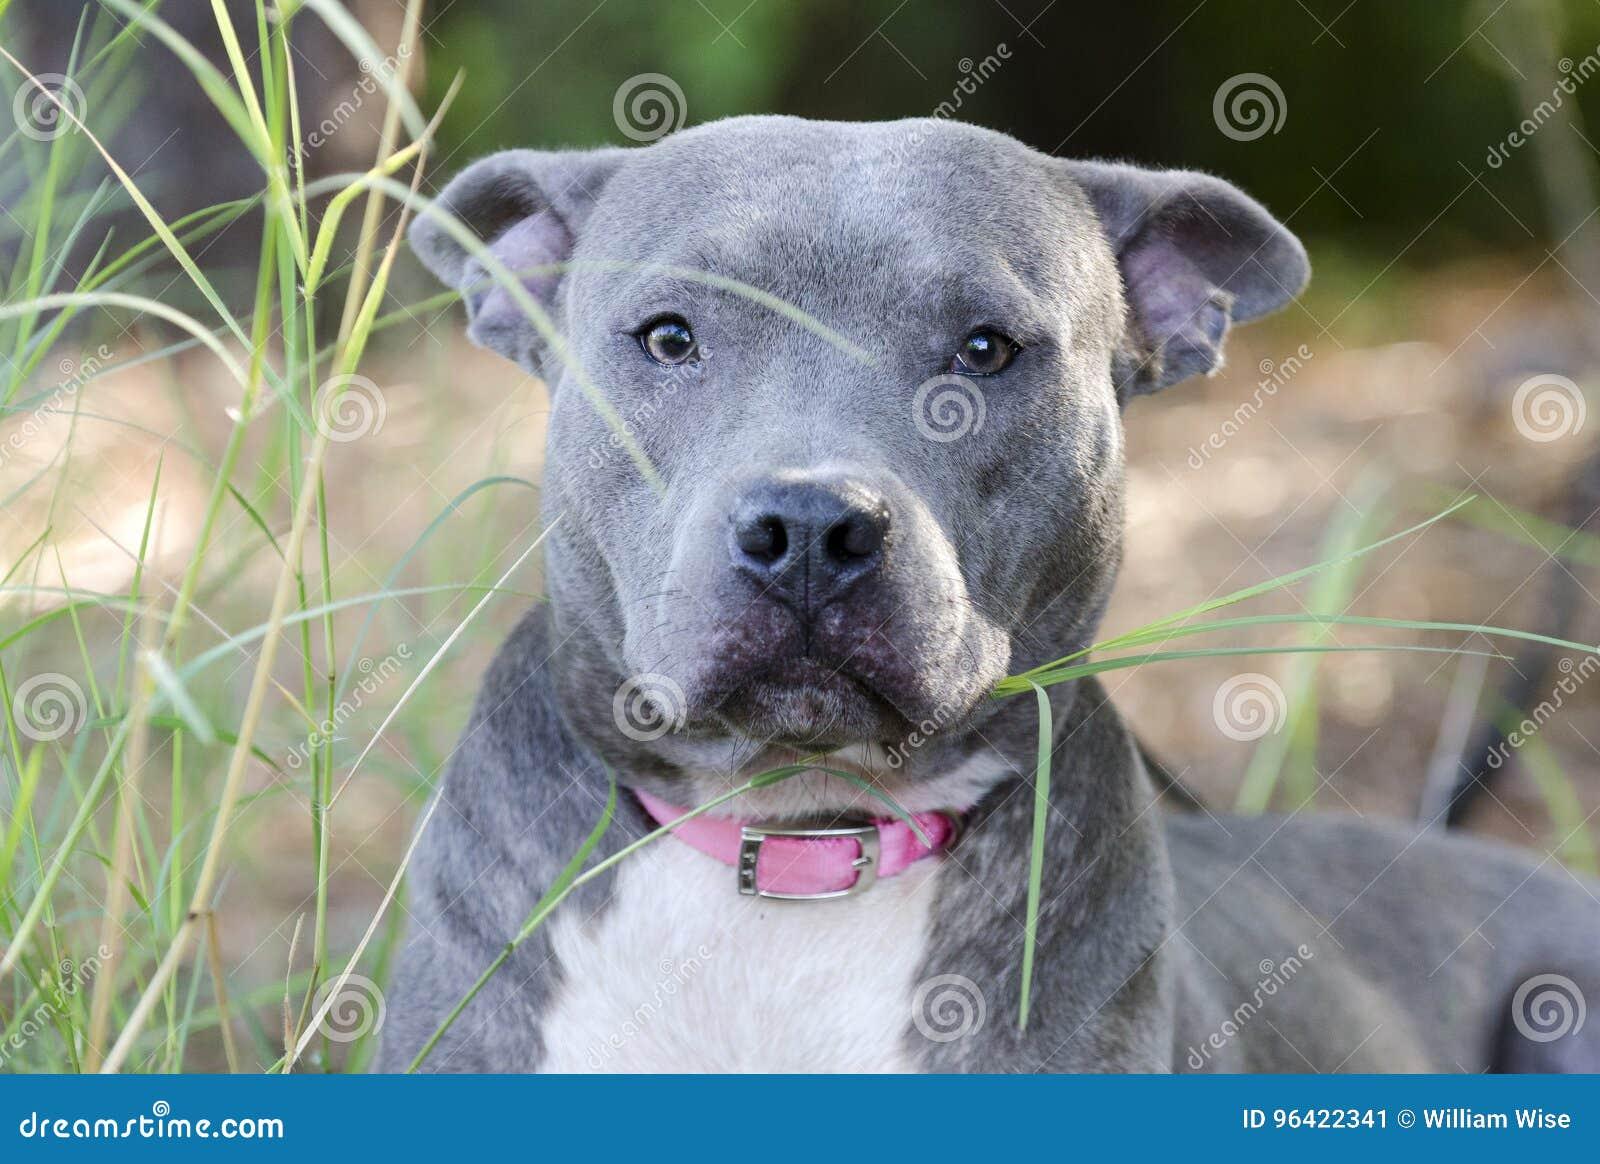 Blue American Pitbull Terrier Dog Stock Image - Image of ... Bull Terrier Blue Nose Pitbull Mix